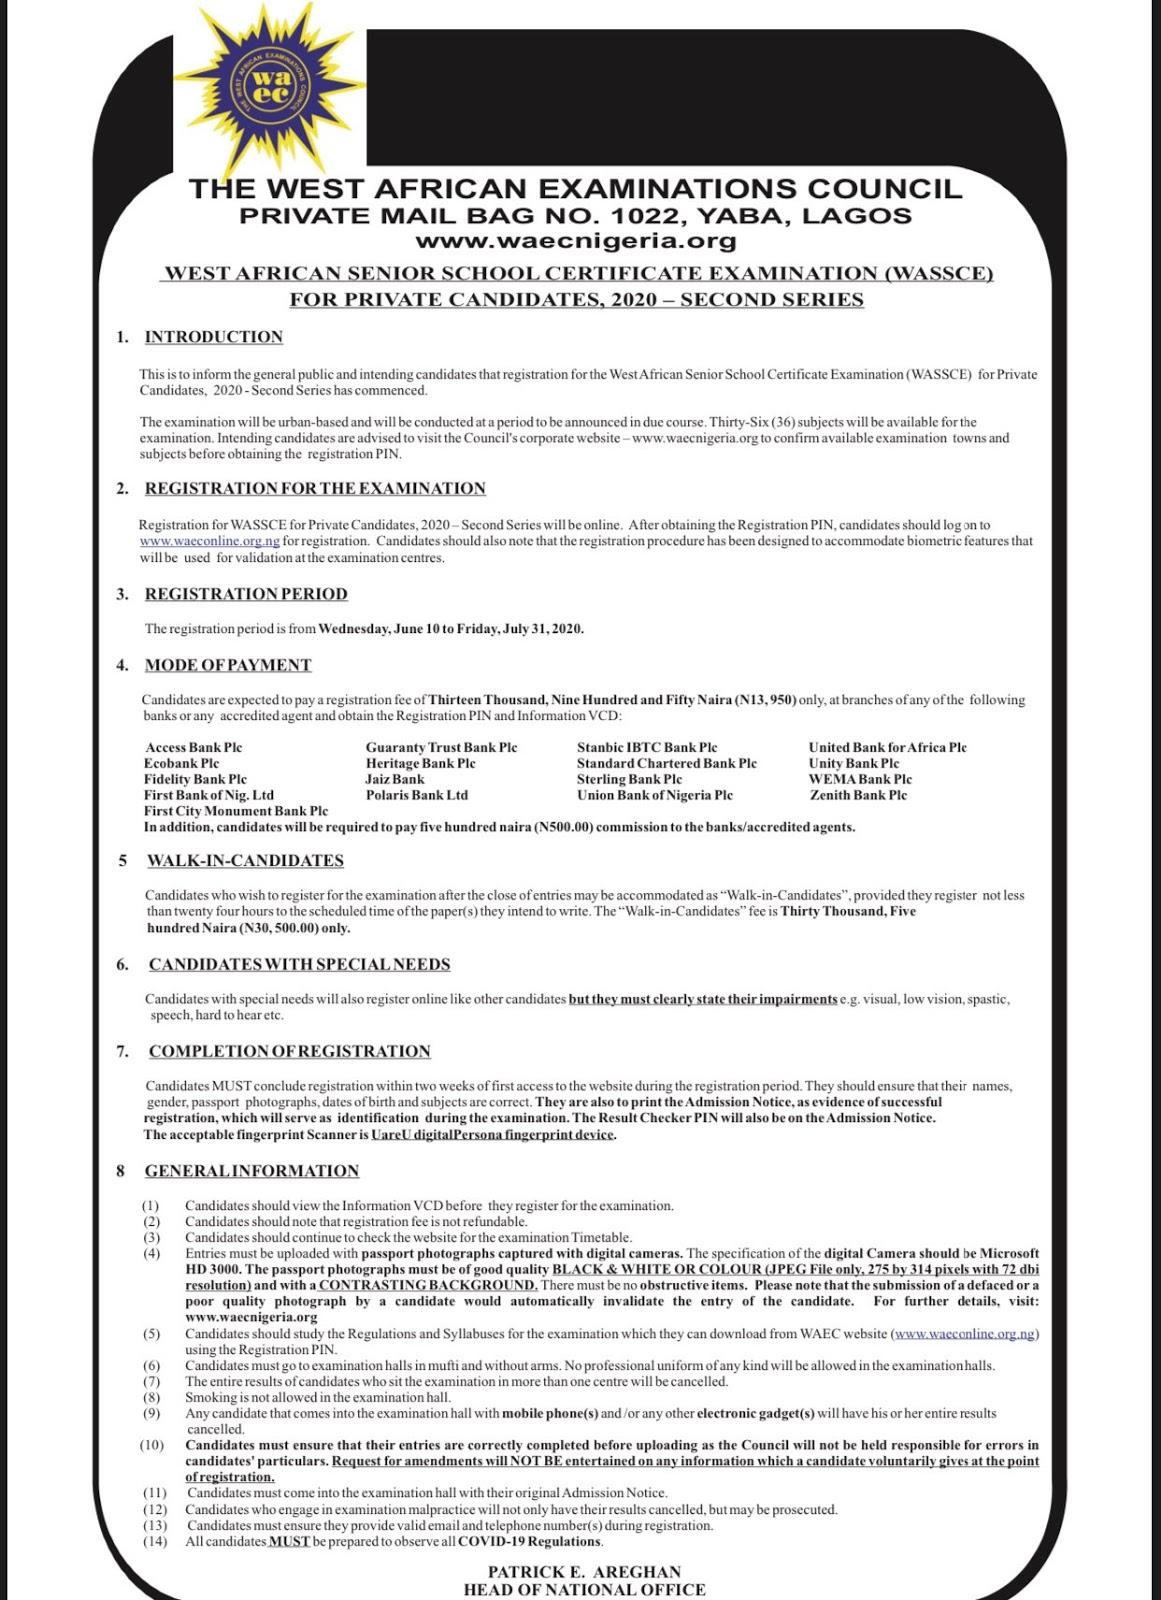 WAEC GCE 2020 Registration Form